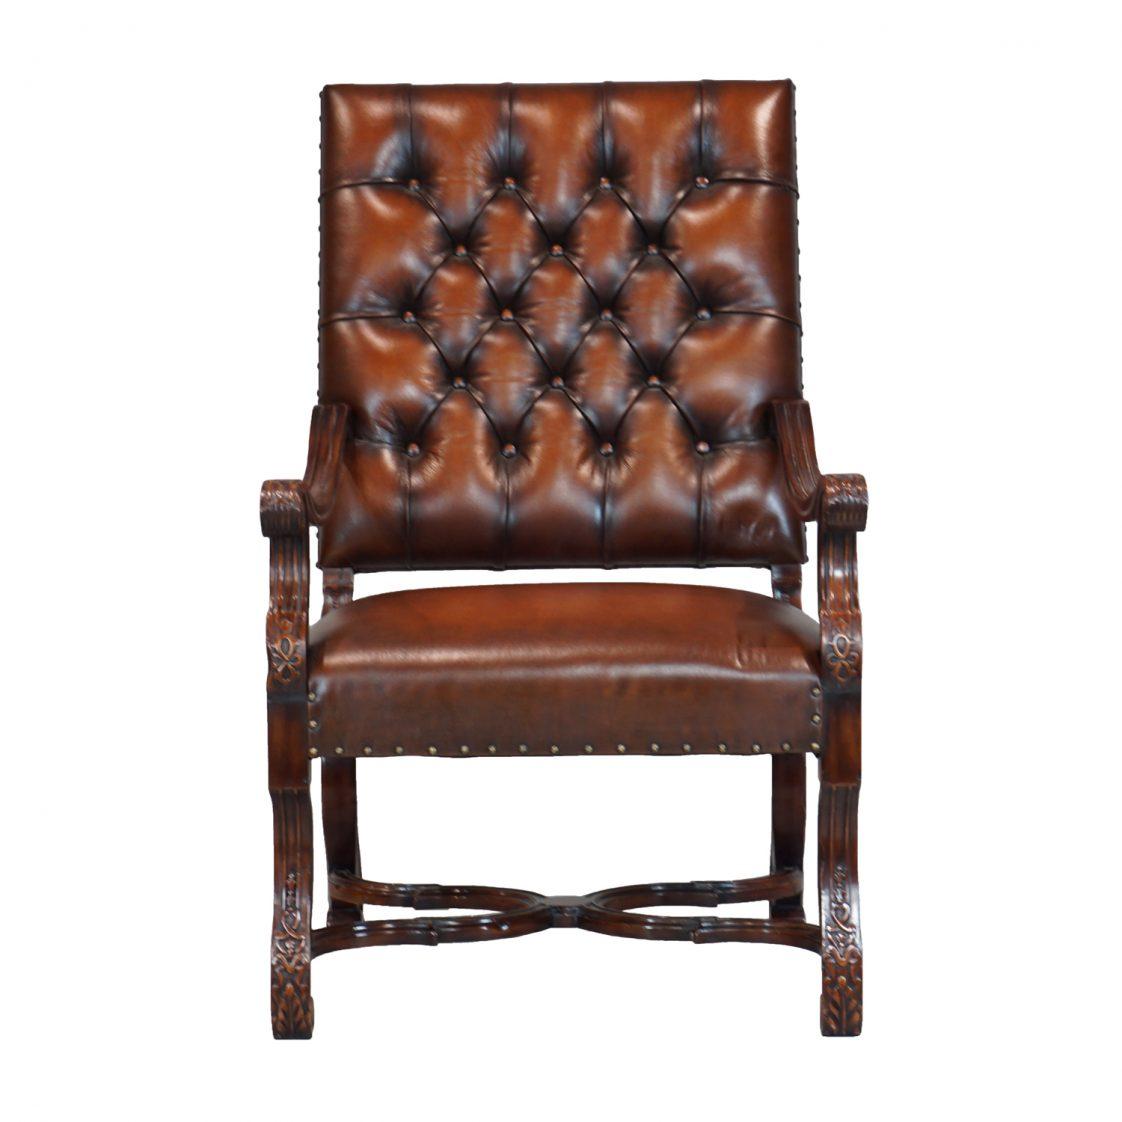 Chair Carver Louis Xviii Jansen Furniture